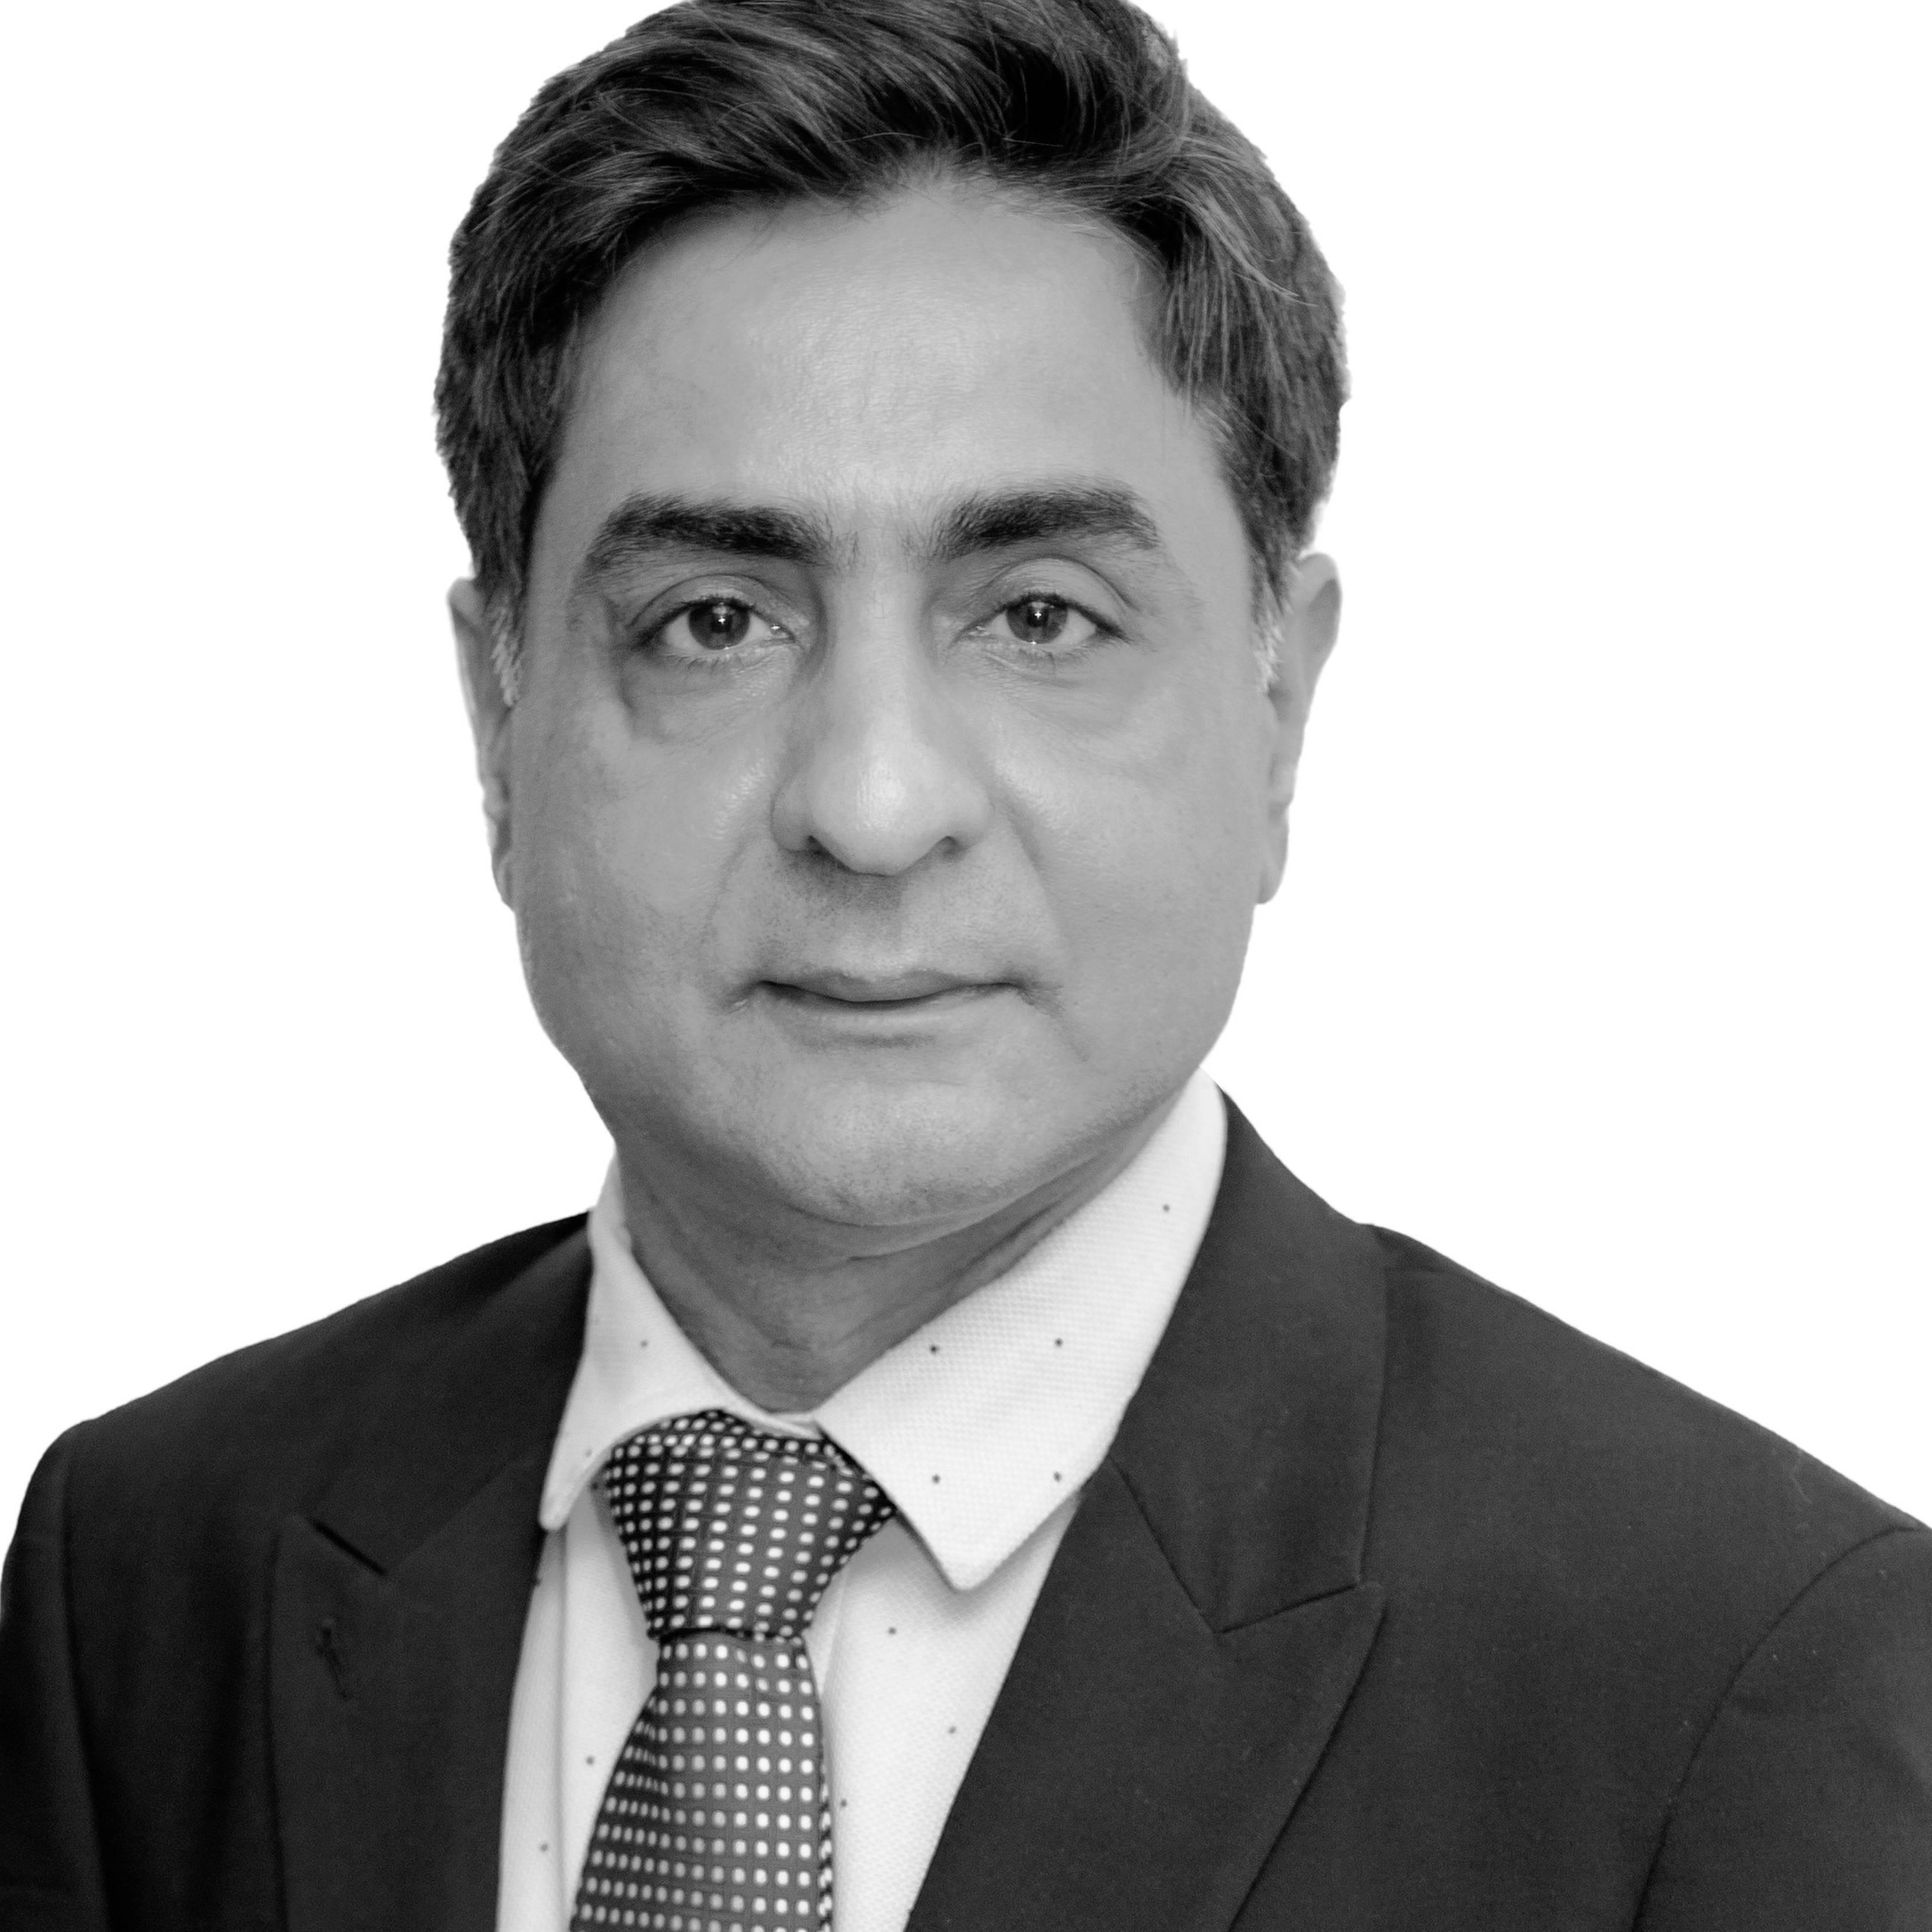 Khalid Khatri